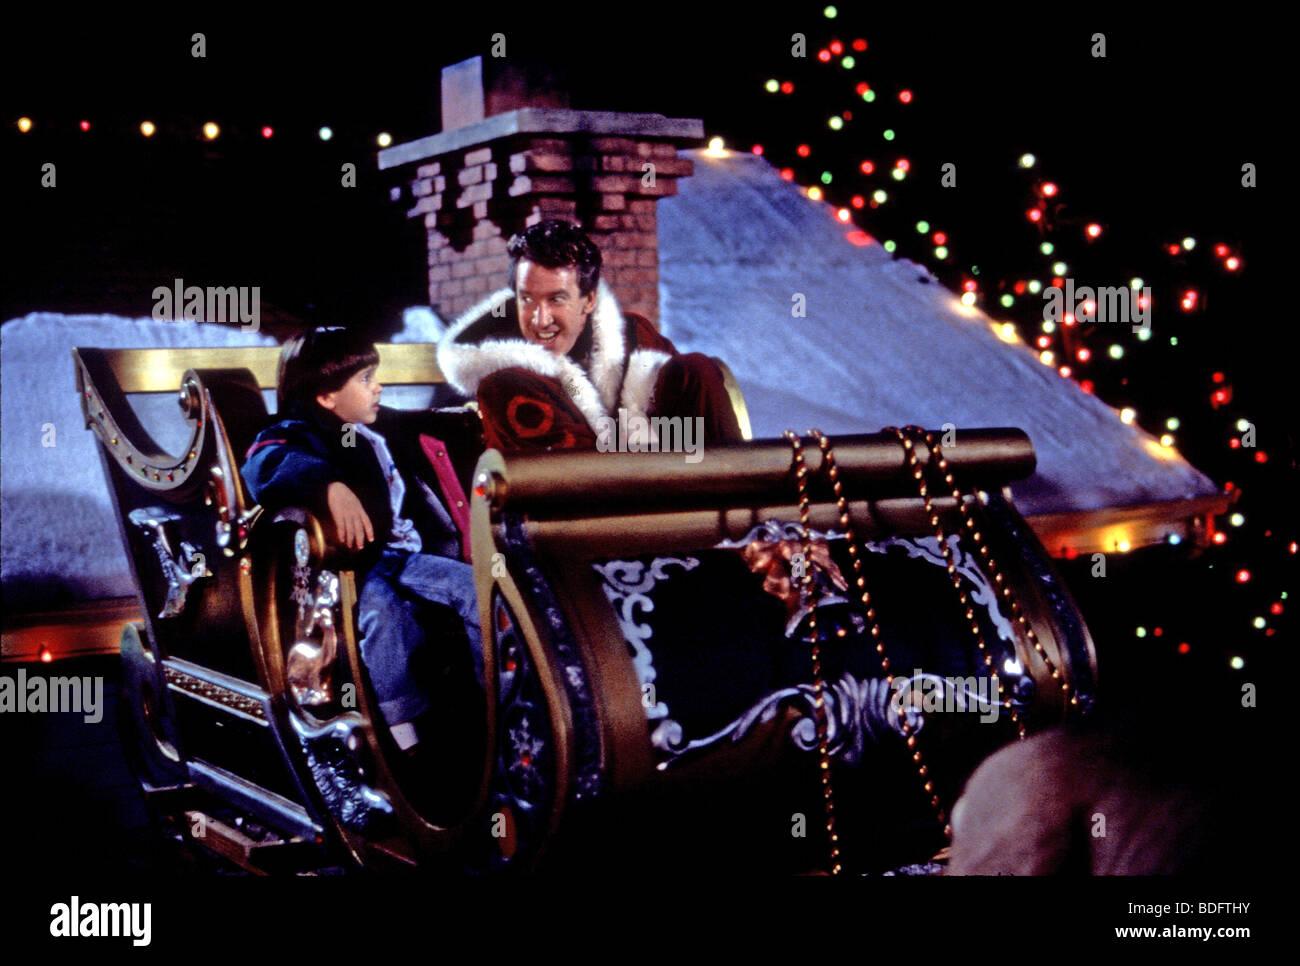 THE SANTA CLAUSE - 1994 Buena Vista/Walt Disney film with Tim Allen - Stock Image